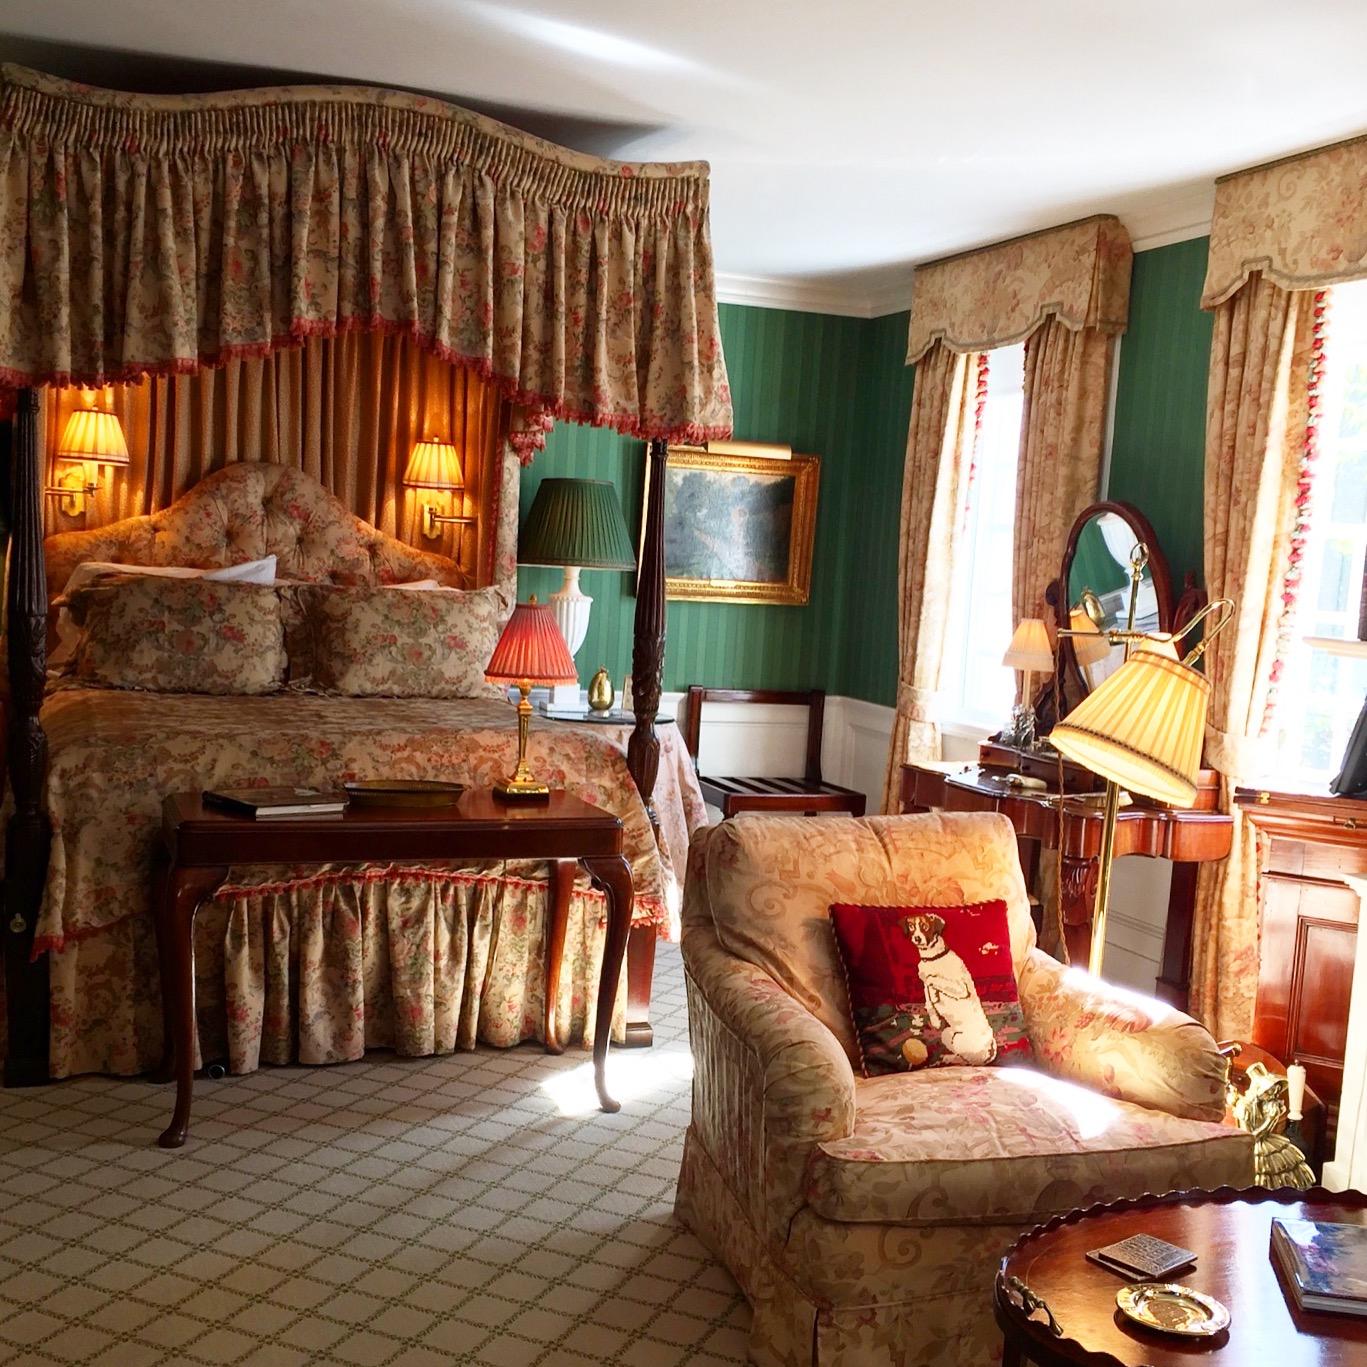 Charlotte Inn on Martha's Vineyard